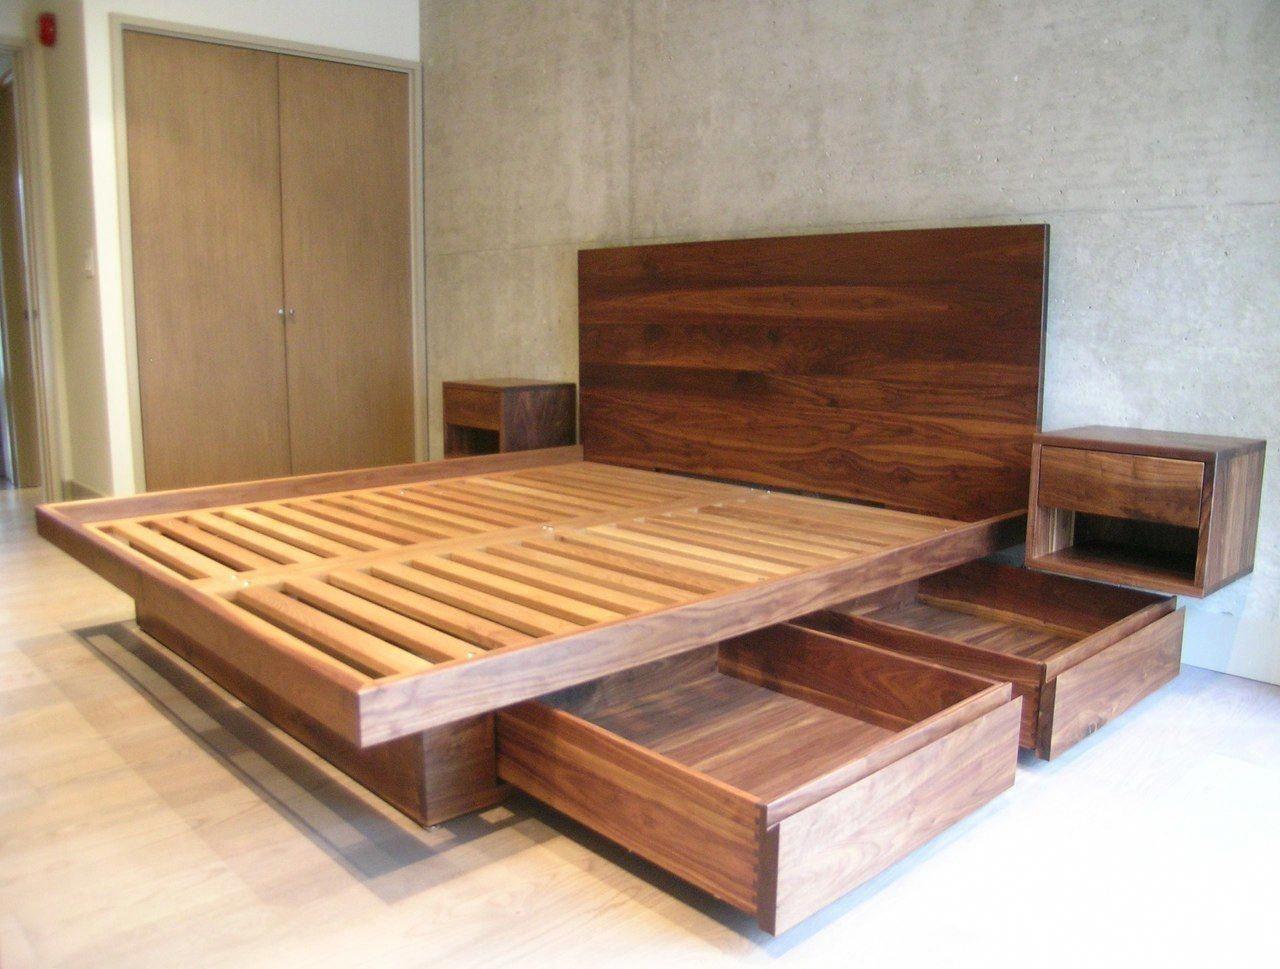 13 Outstanding Bed Frame And Headboard Full Bed Frames King Size Platform #furni…